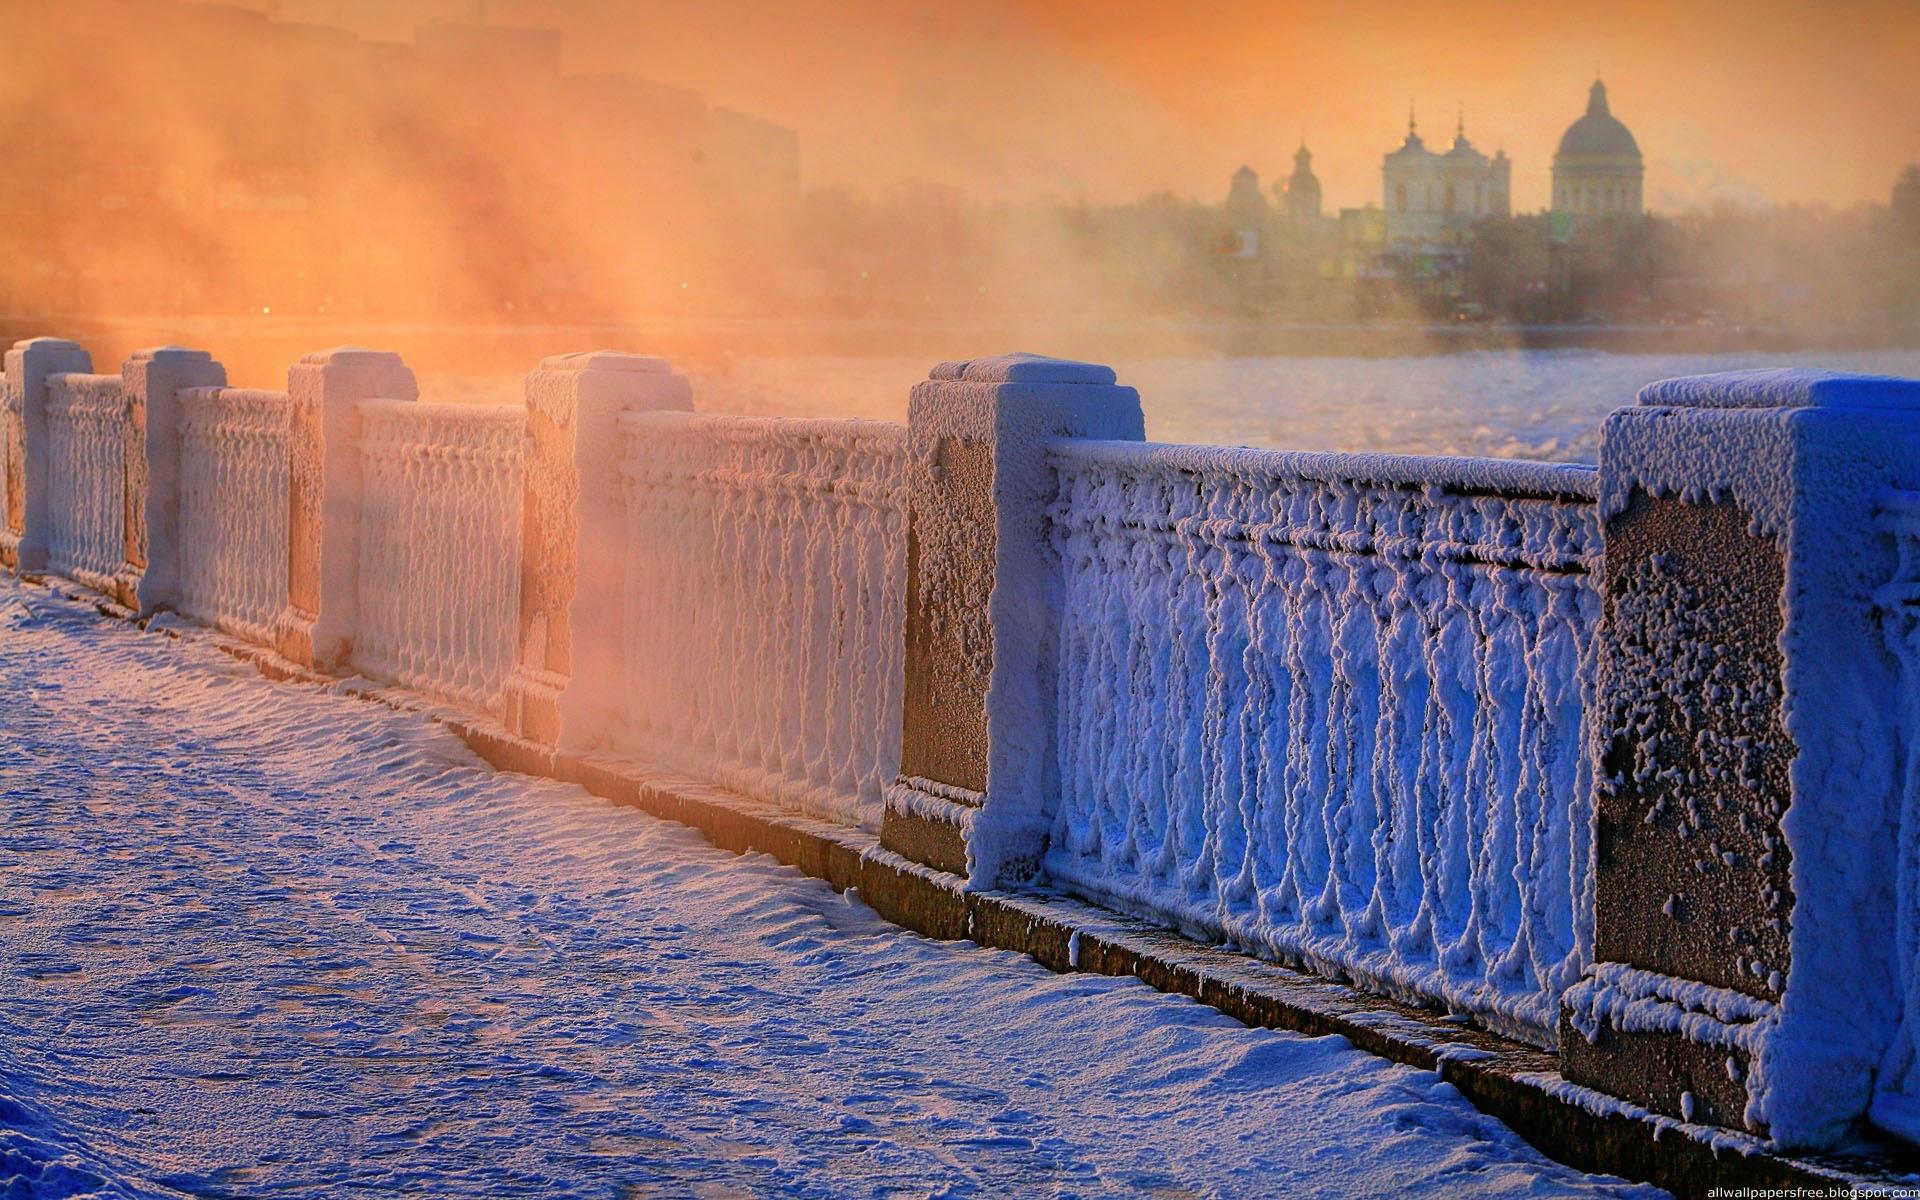 Winter_Snow_in_St._Petersburg_on_the_bridge_056670_